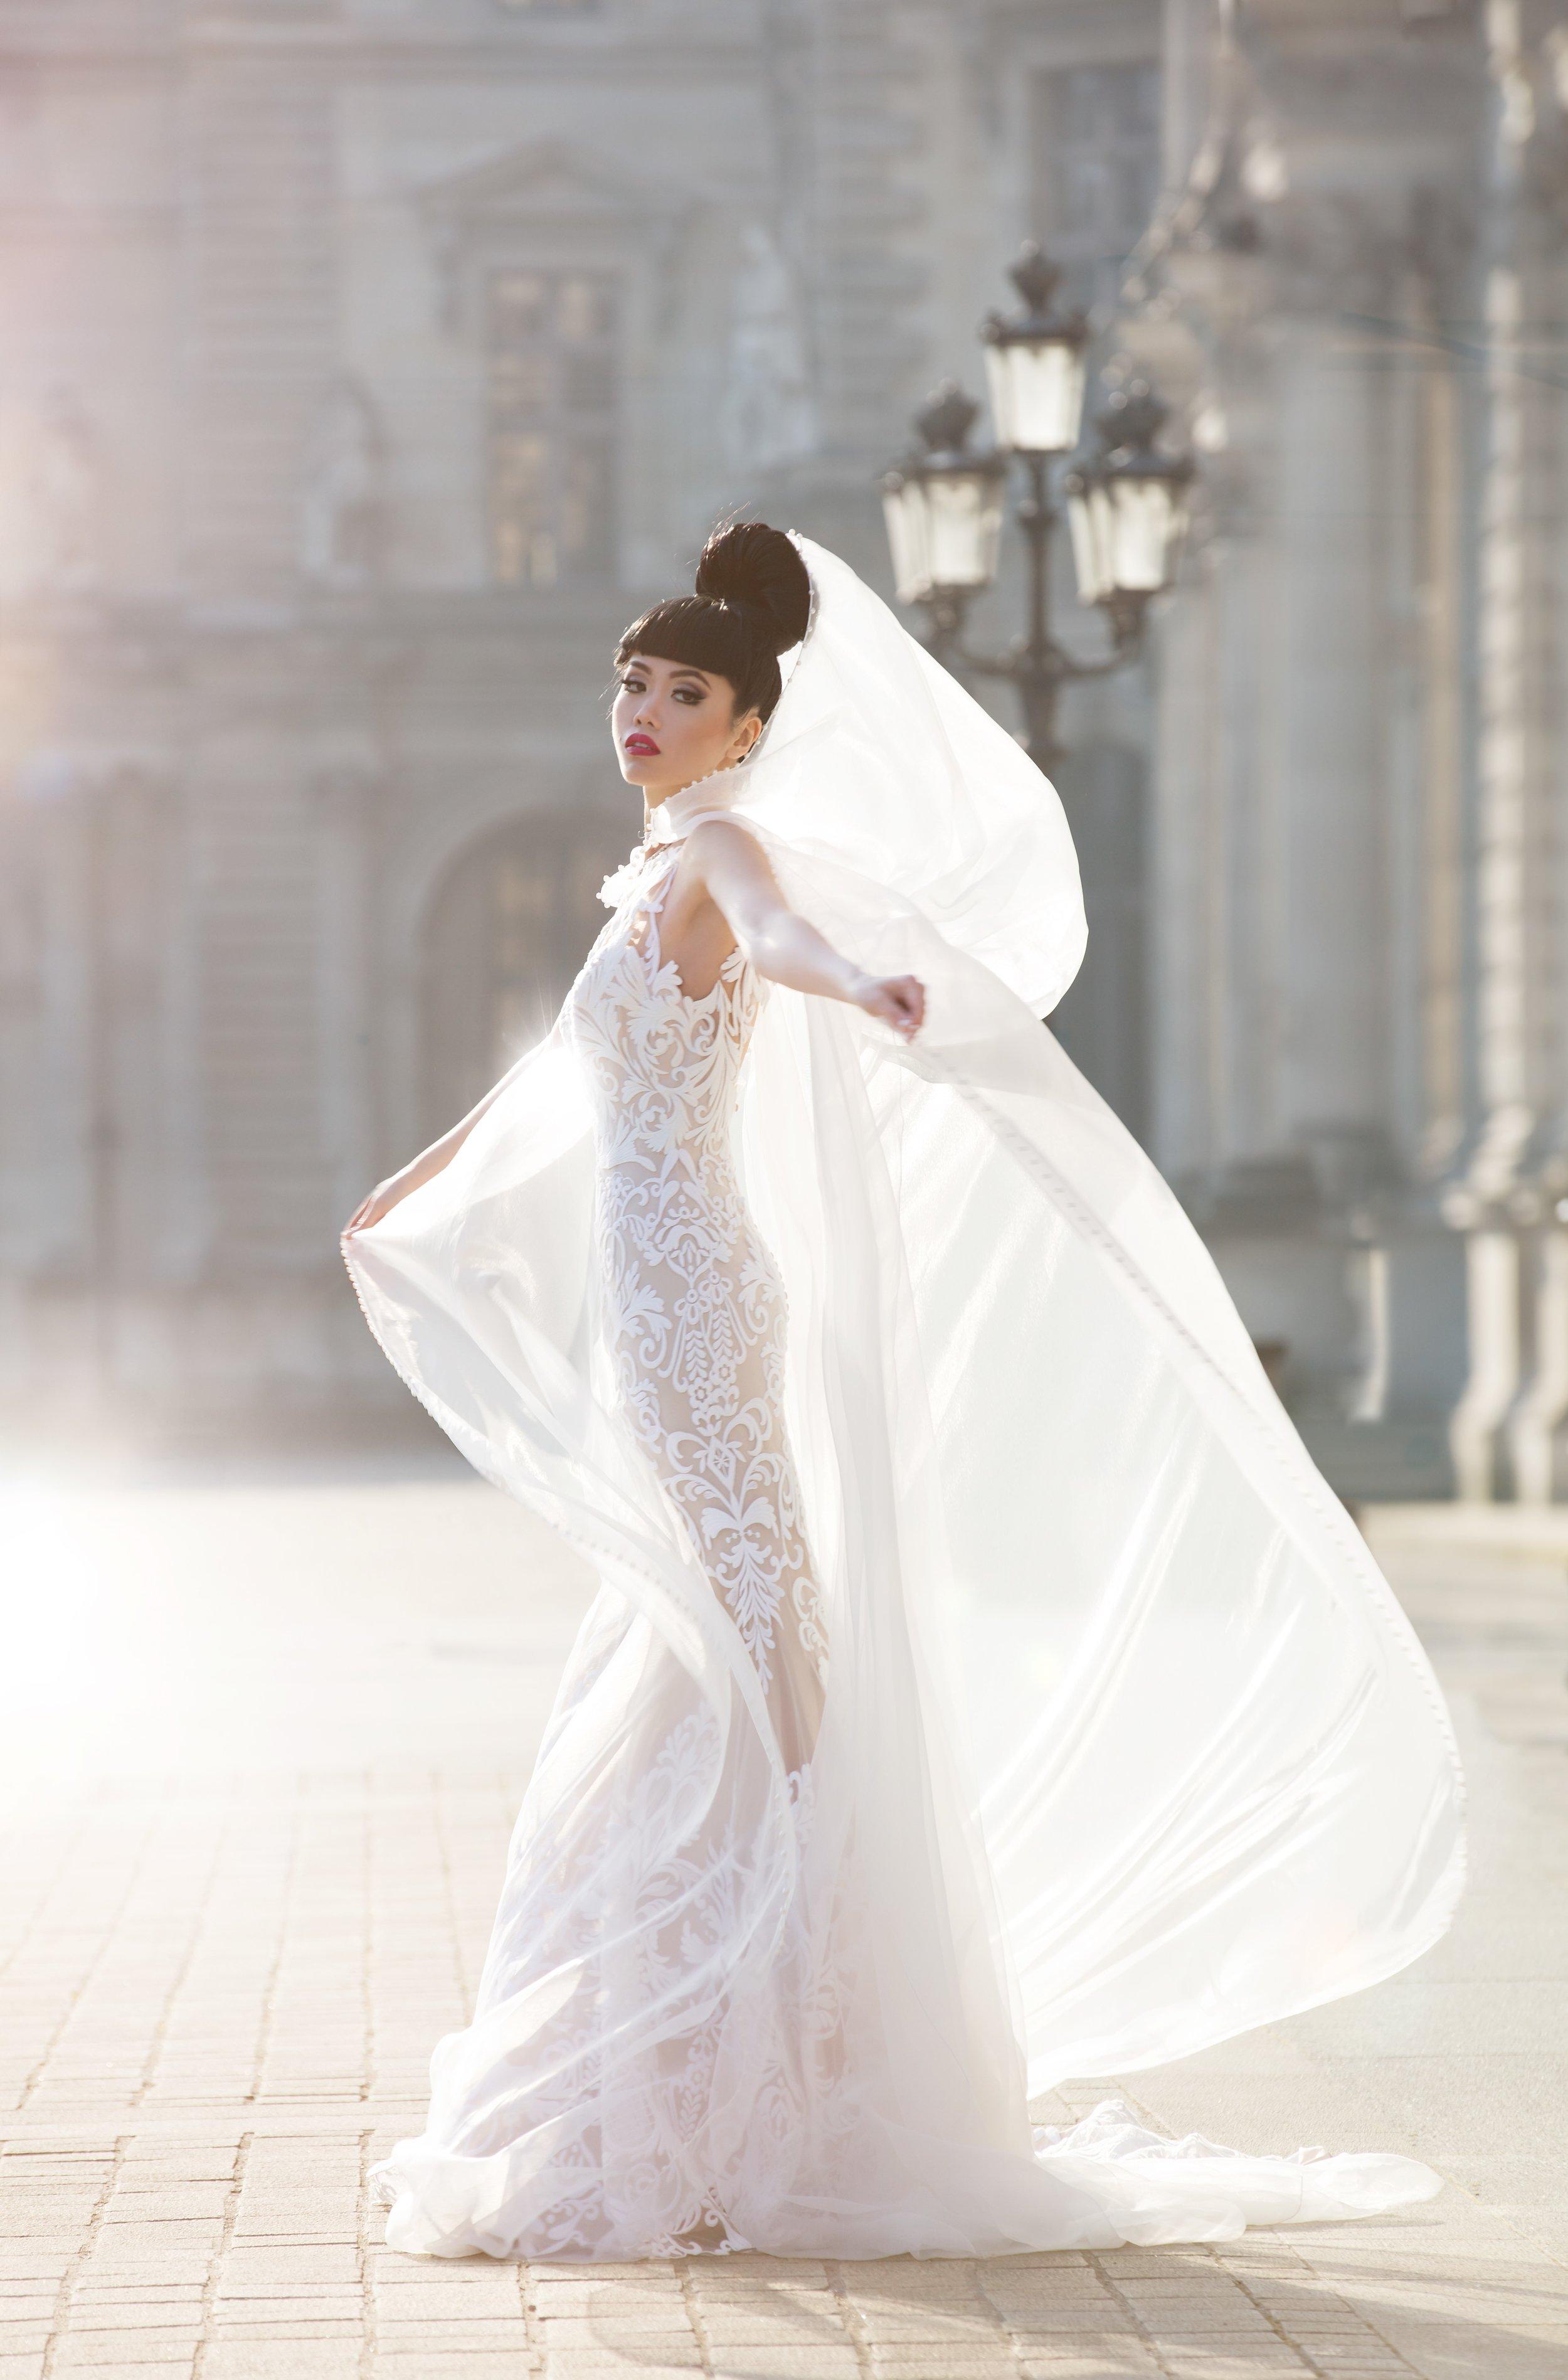 Jessica Minh Anh in Yumi Katsura Faith gown high rez .jpg